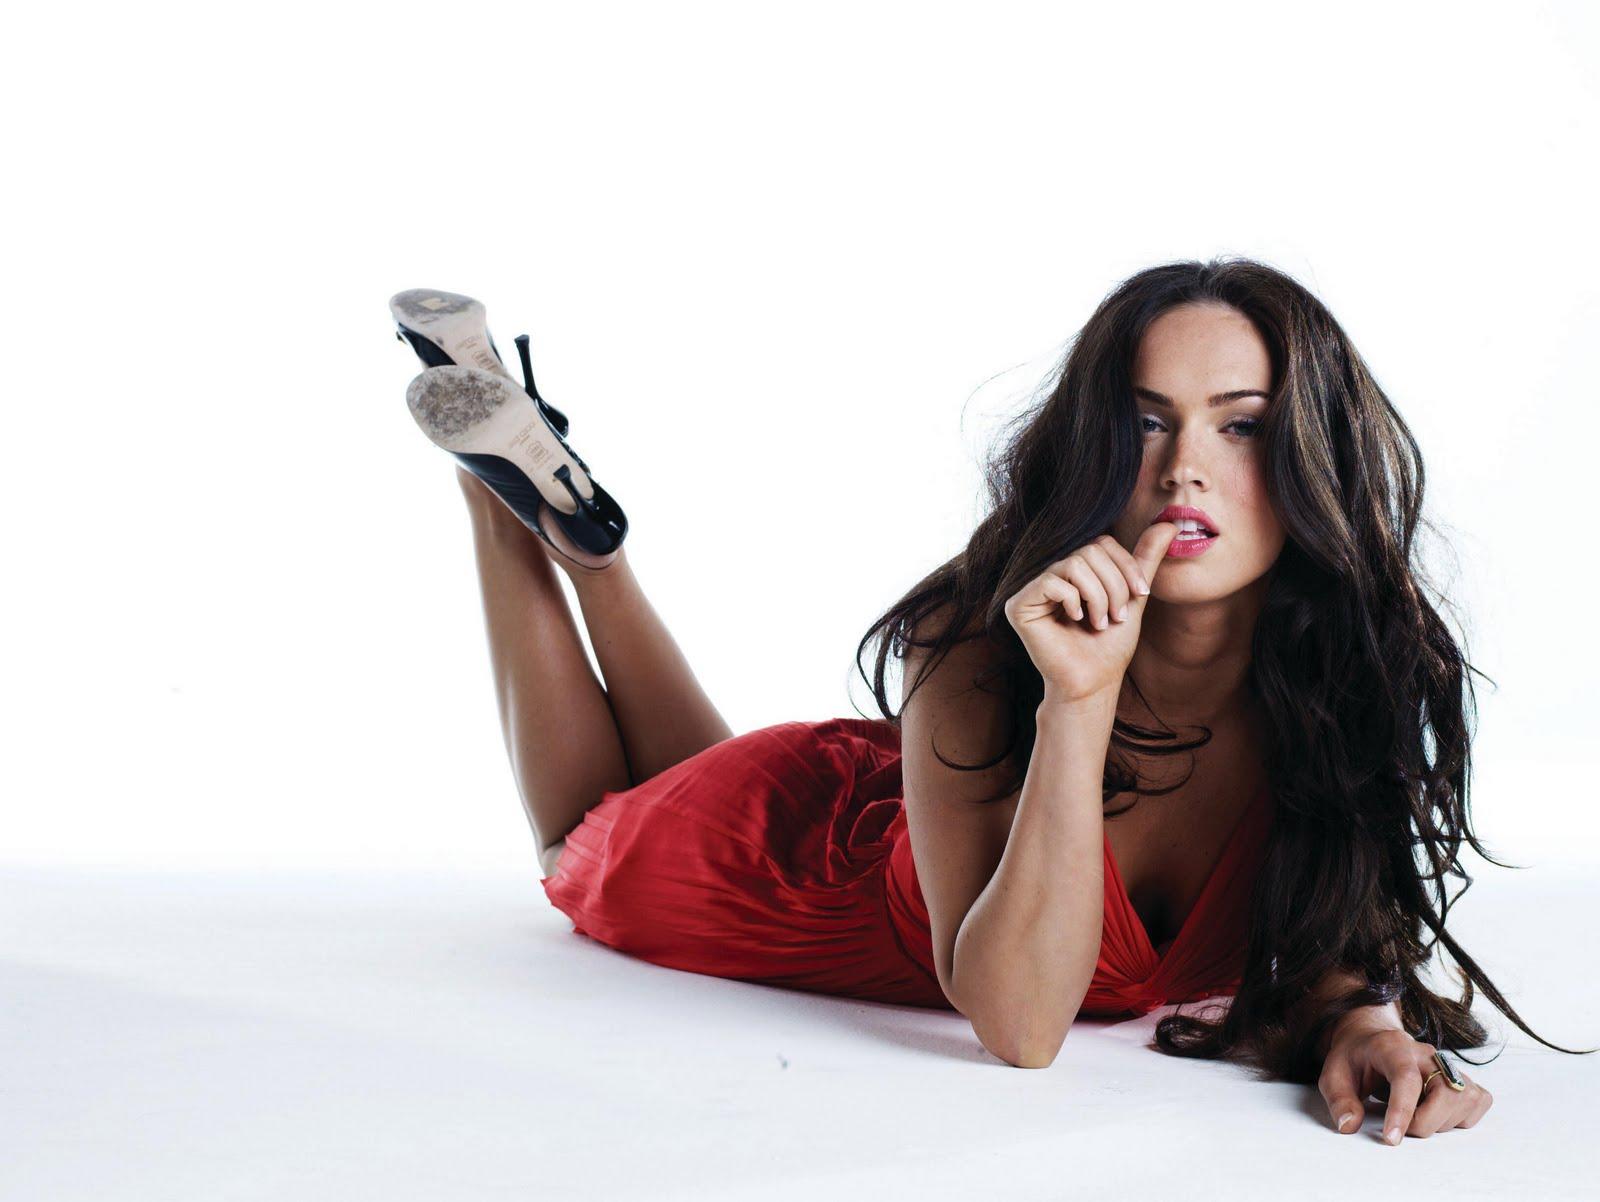 Megan Fox in Naughty Mood 5